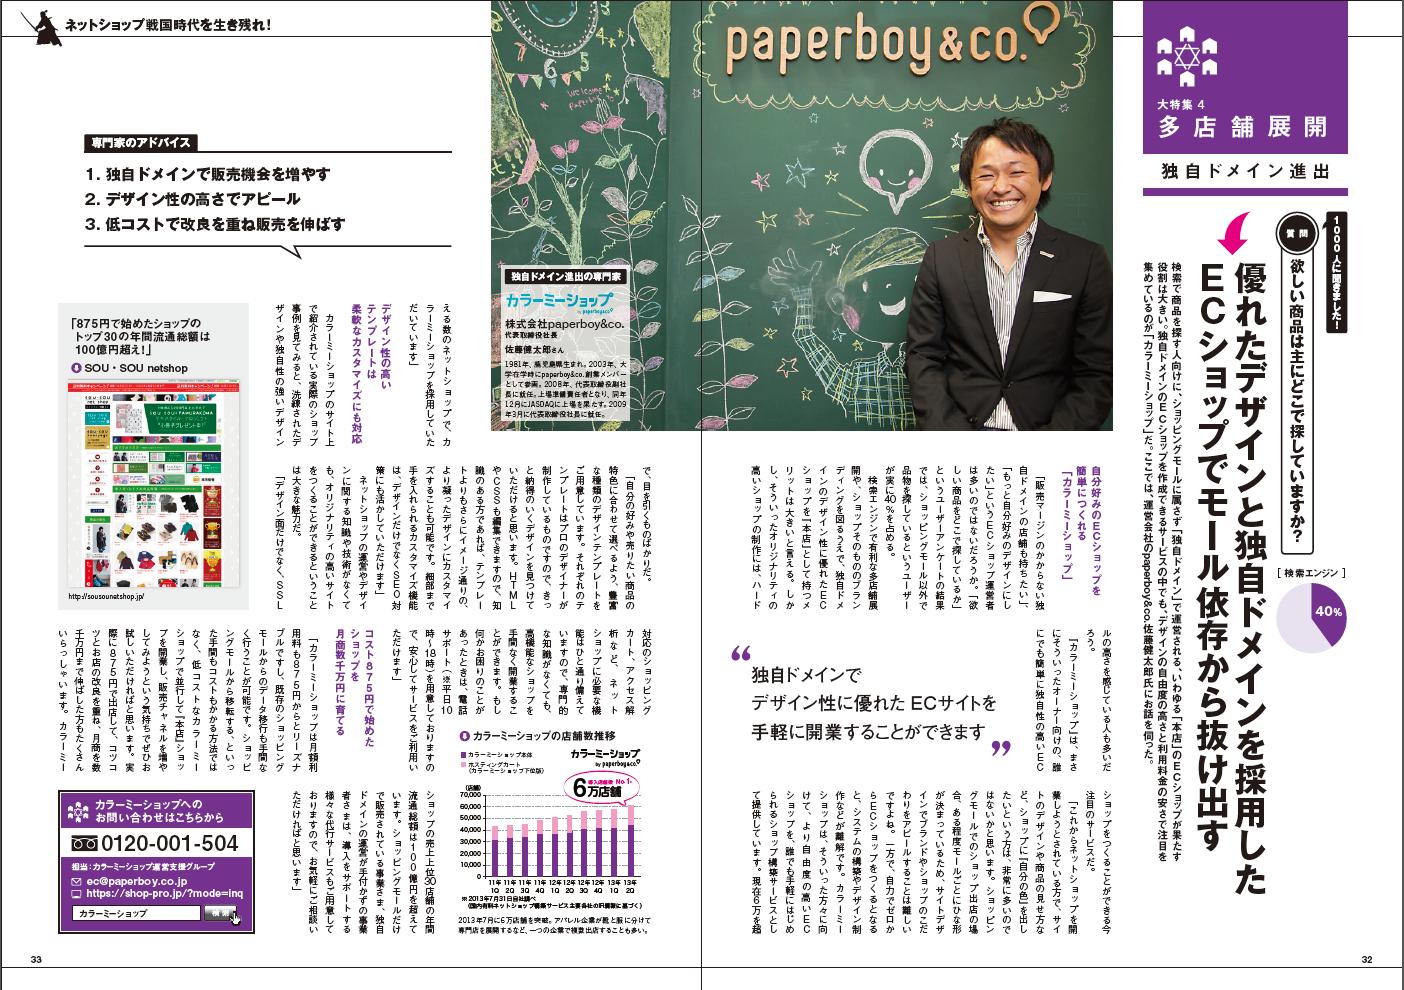 ECのミカタ通信にカラーミーショップ運営・paperboy&co.代表取締役社長佐藤健太郎インタビューが掲載されました。